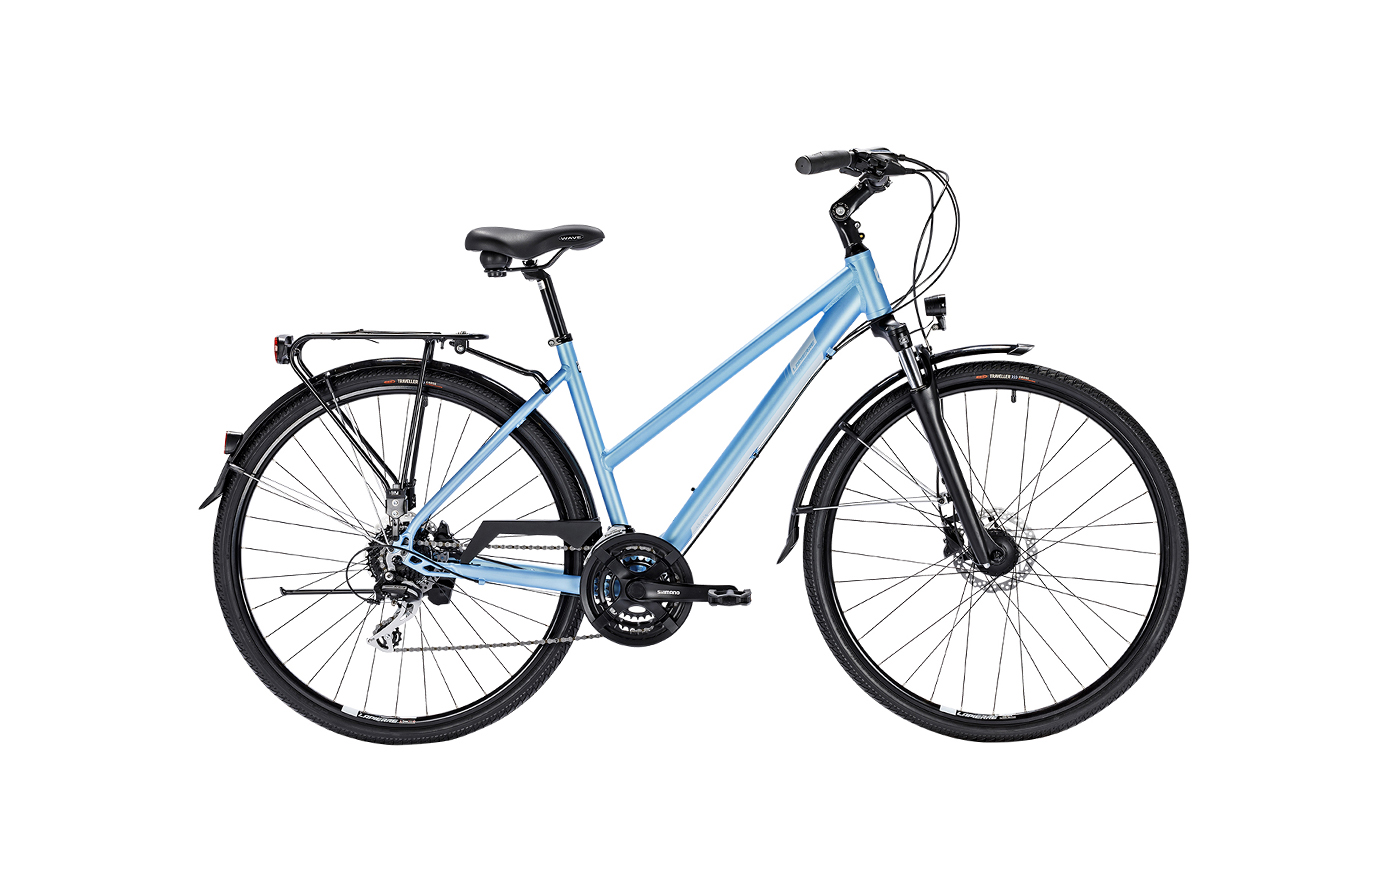 Bicykel LAPIERRE TREKKING 200 W 2018